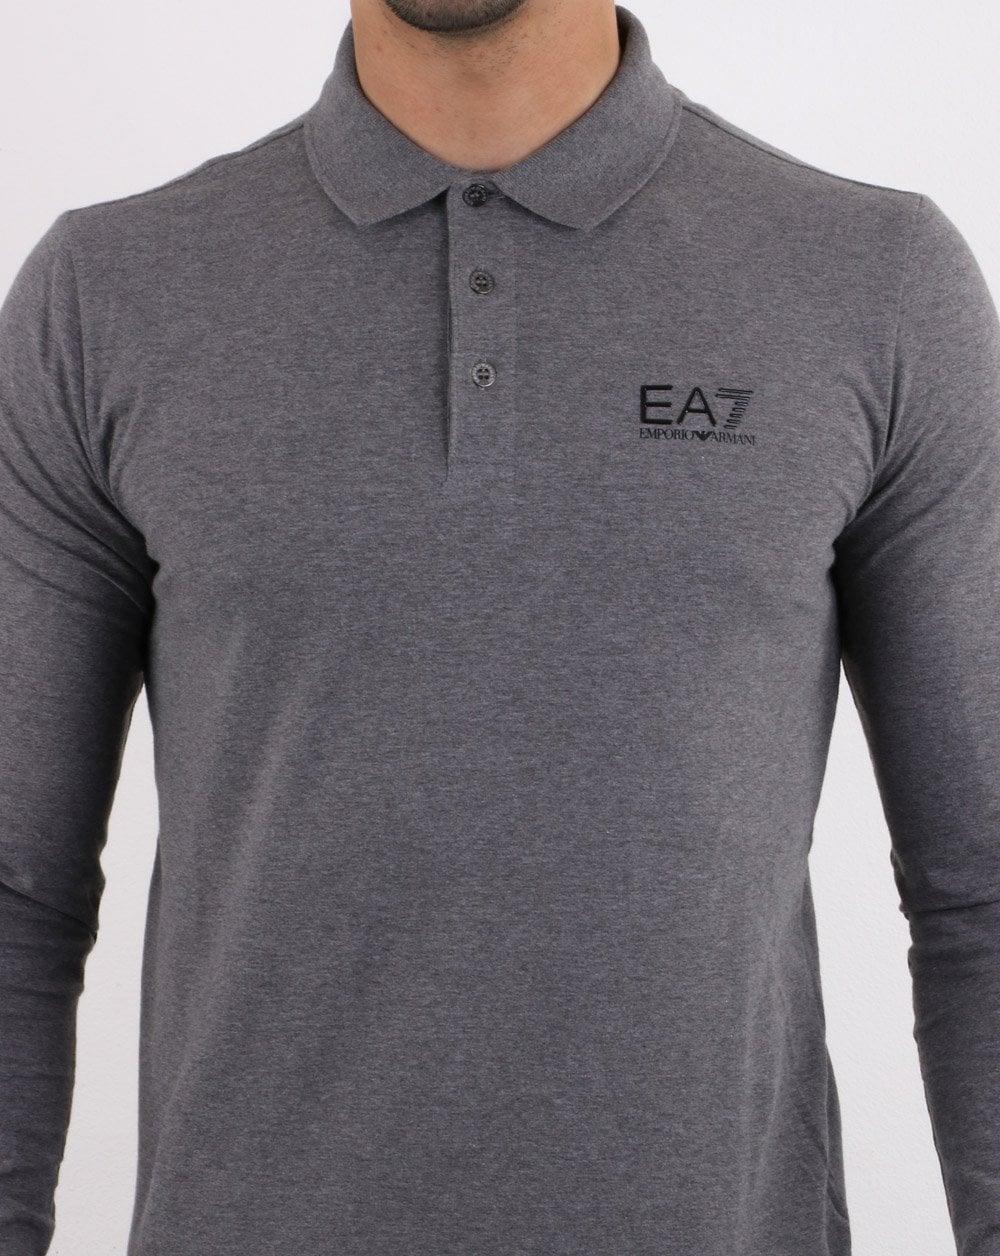 10236818 EA7 Long Sleeve Polo Shirt in Dark Grey | 80s Casual Classics